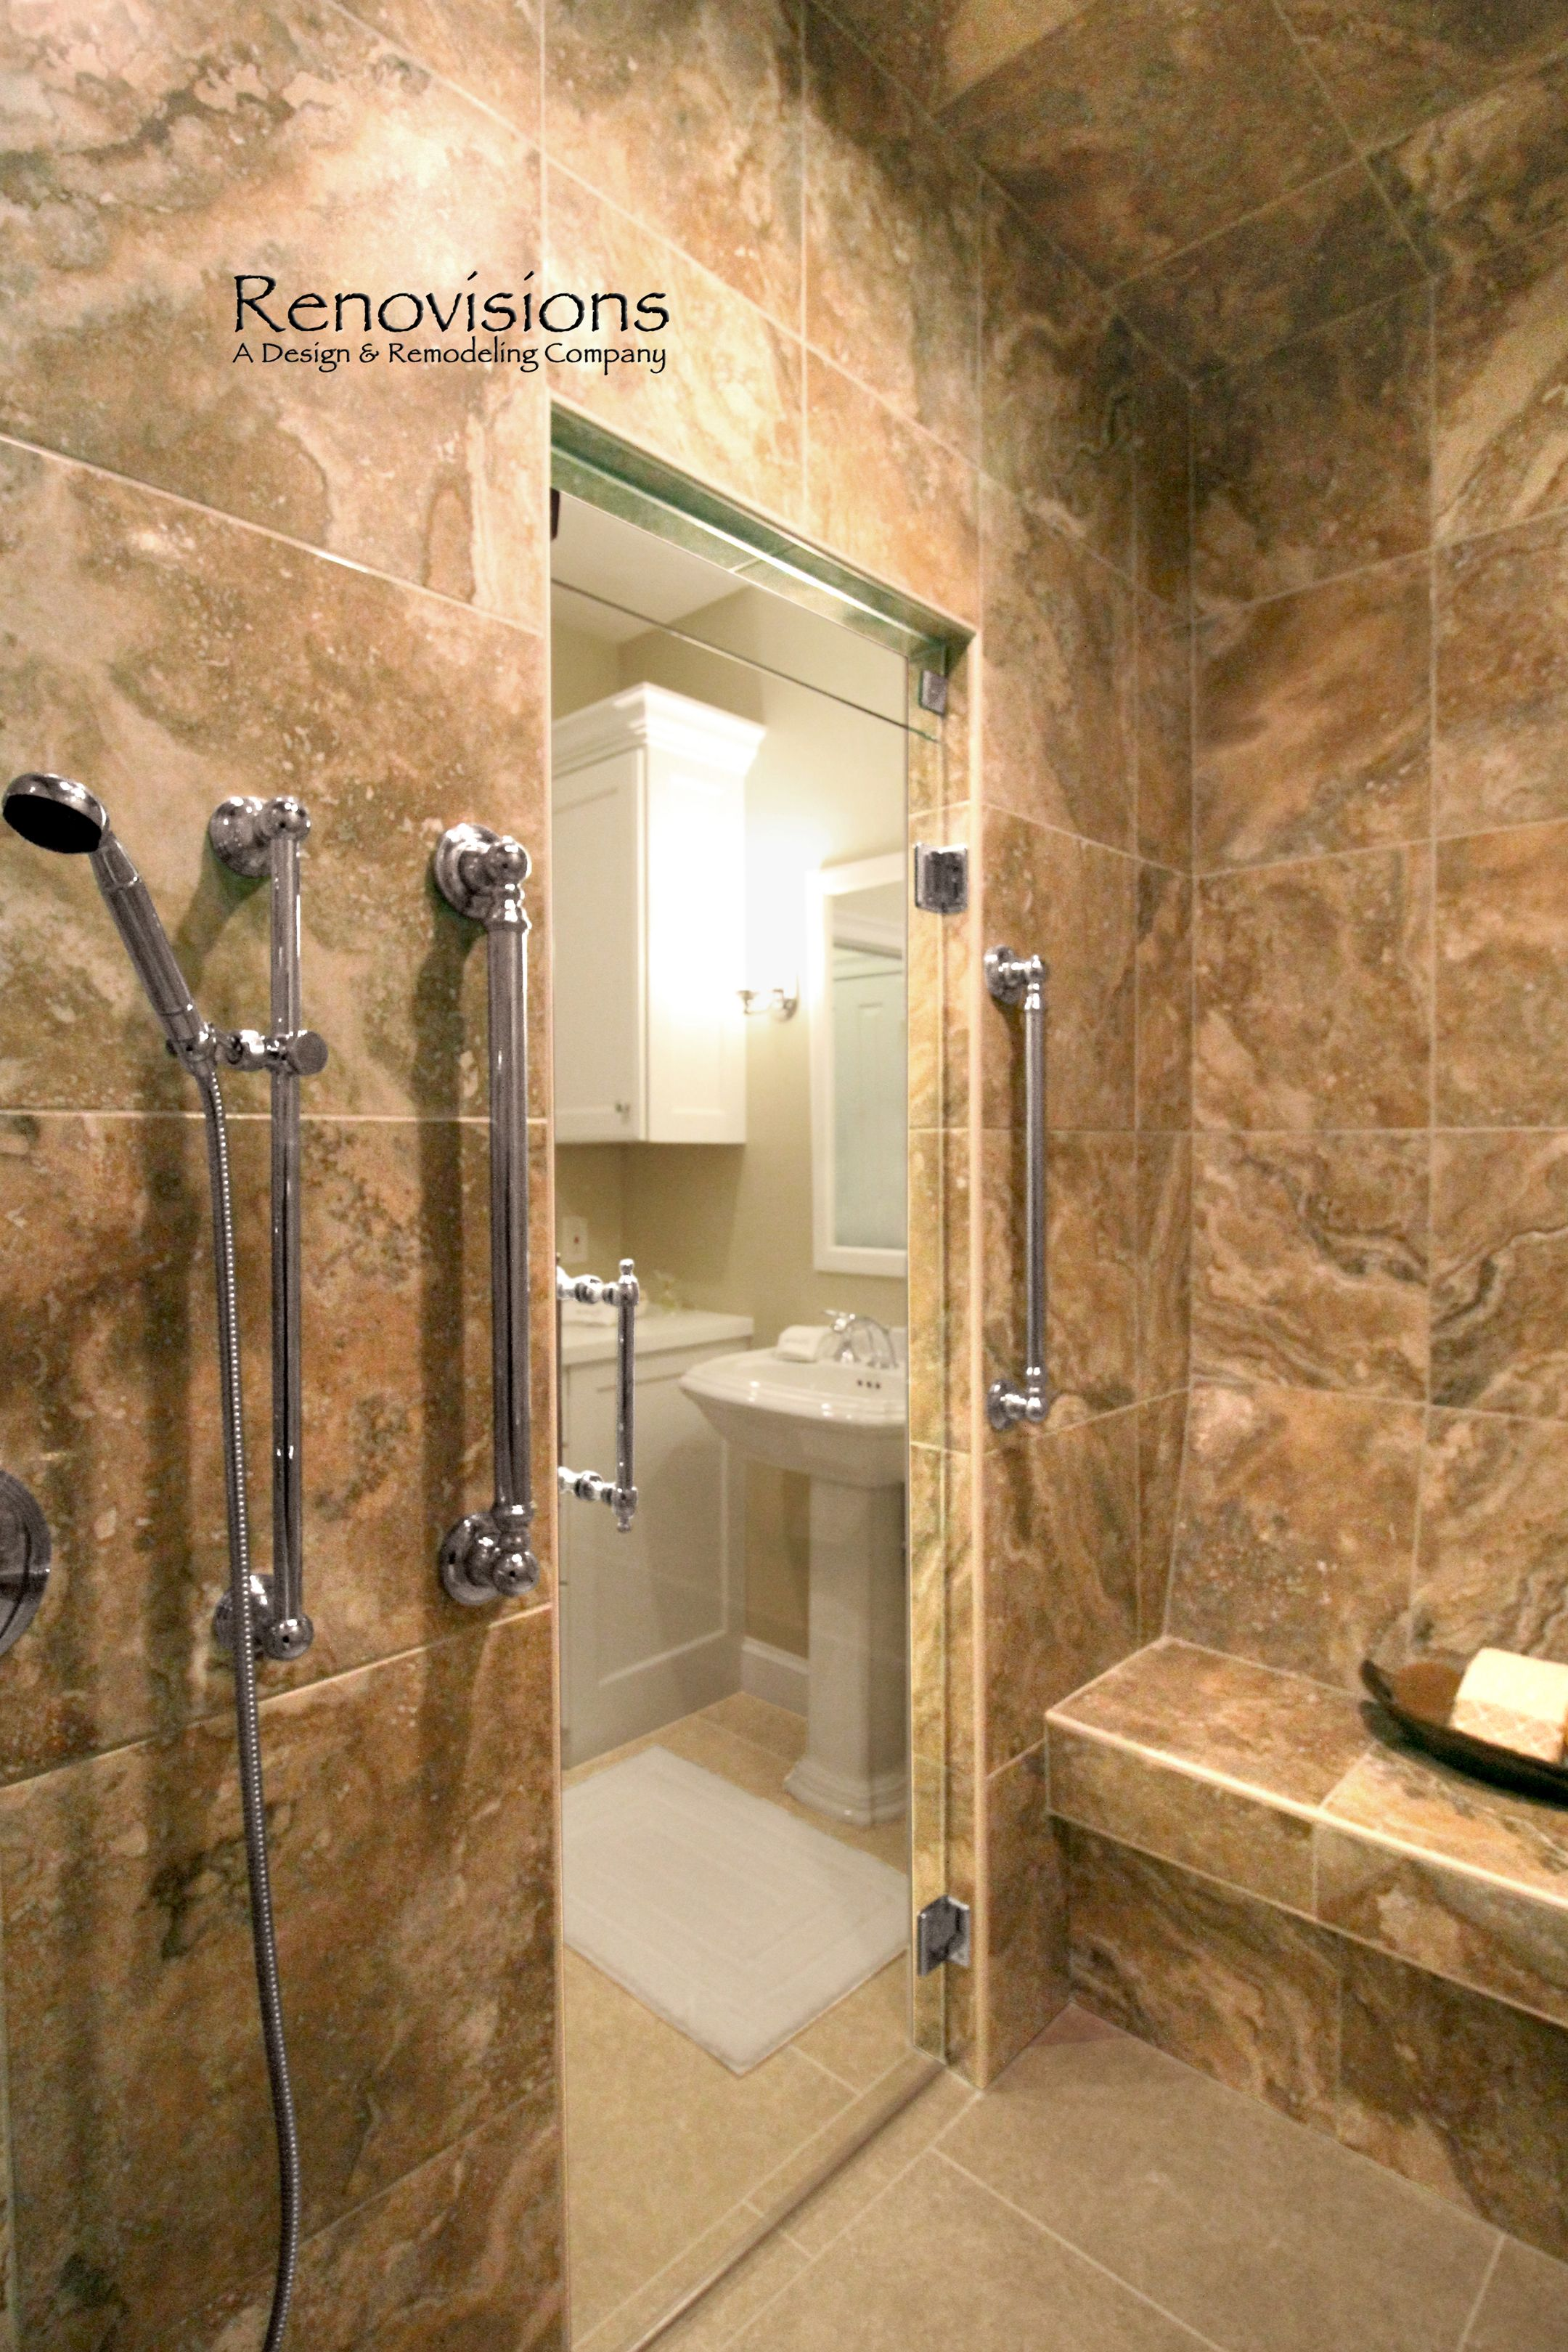 master bathroom remodel by renovisions tile shower bench seat safety grab bars